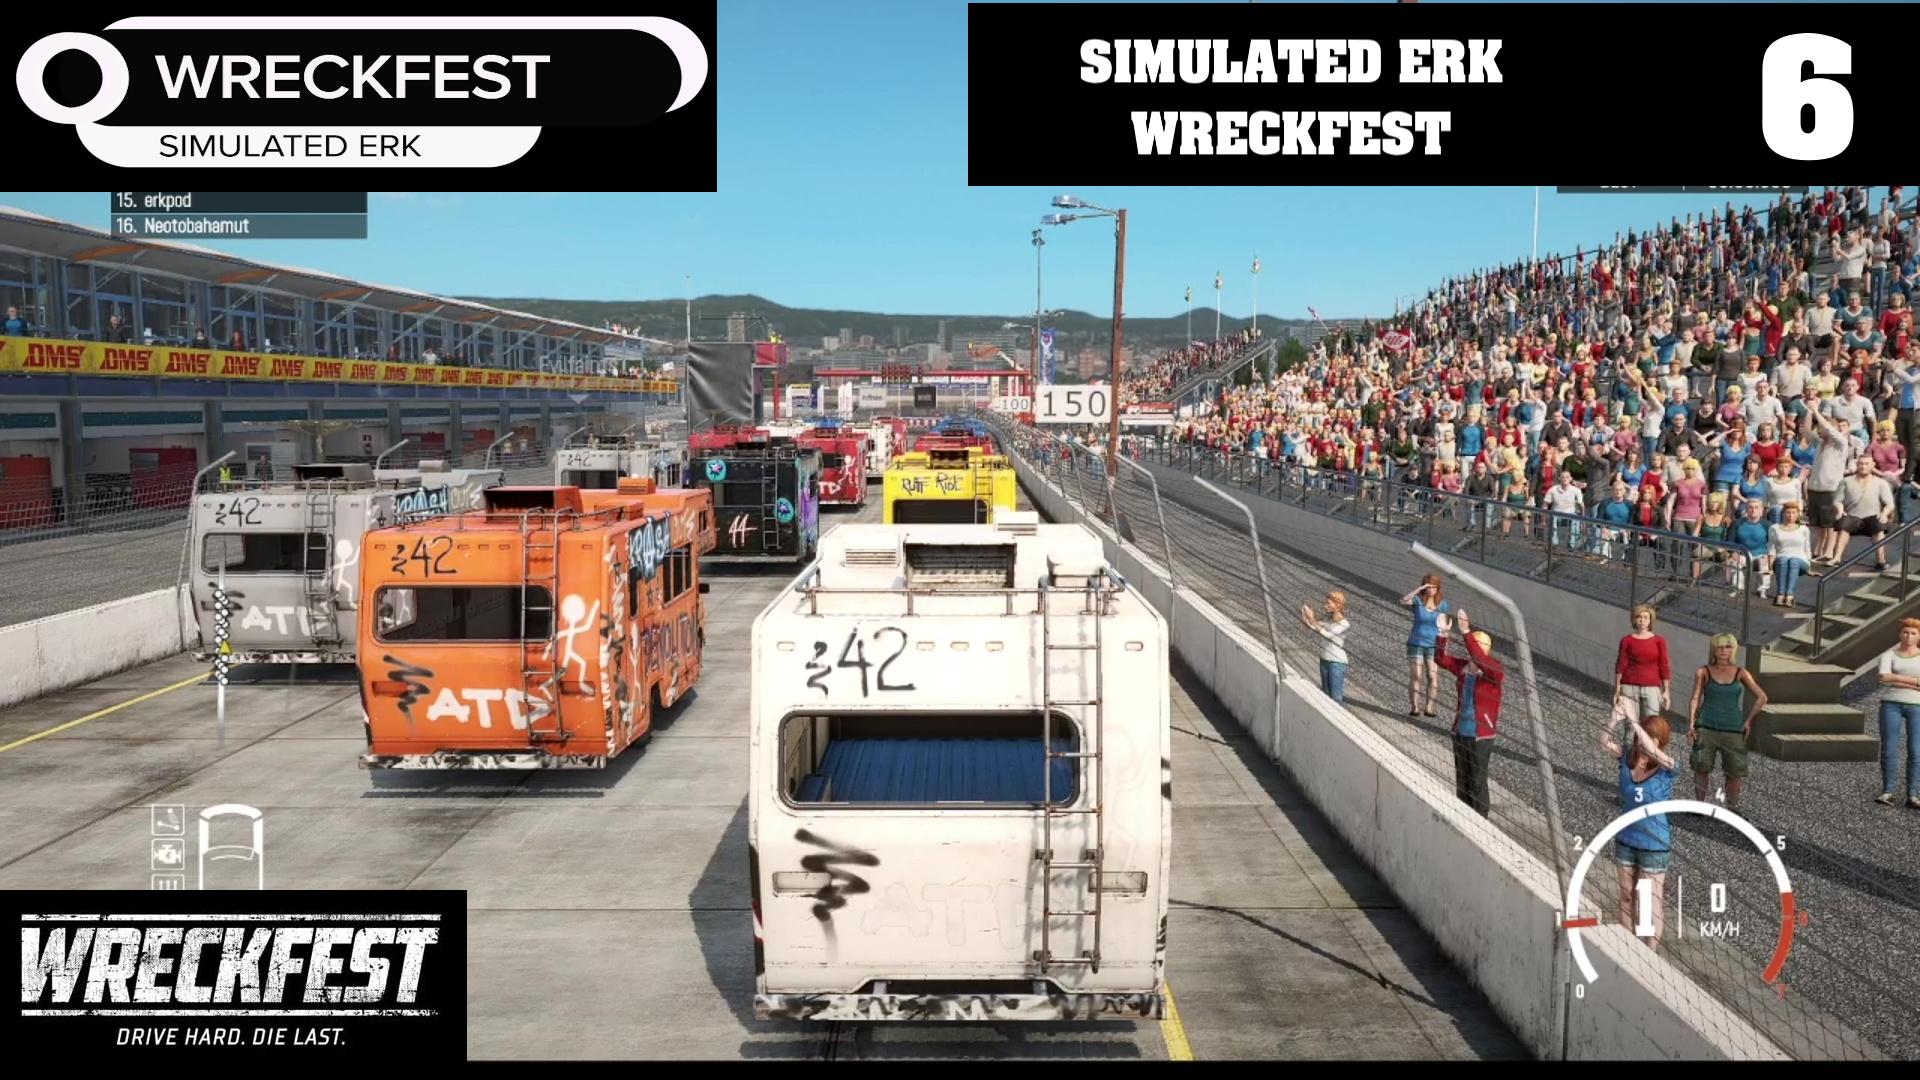 Simulated Erk: Wreckfest episode 6 | Where Motorhomes Go To Die